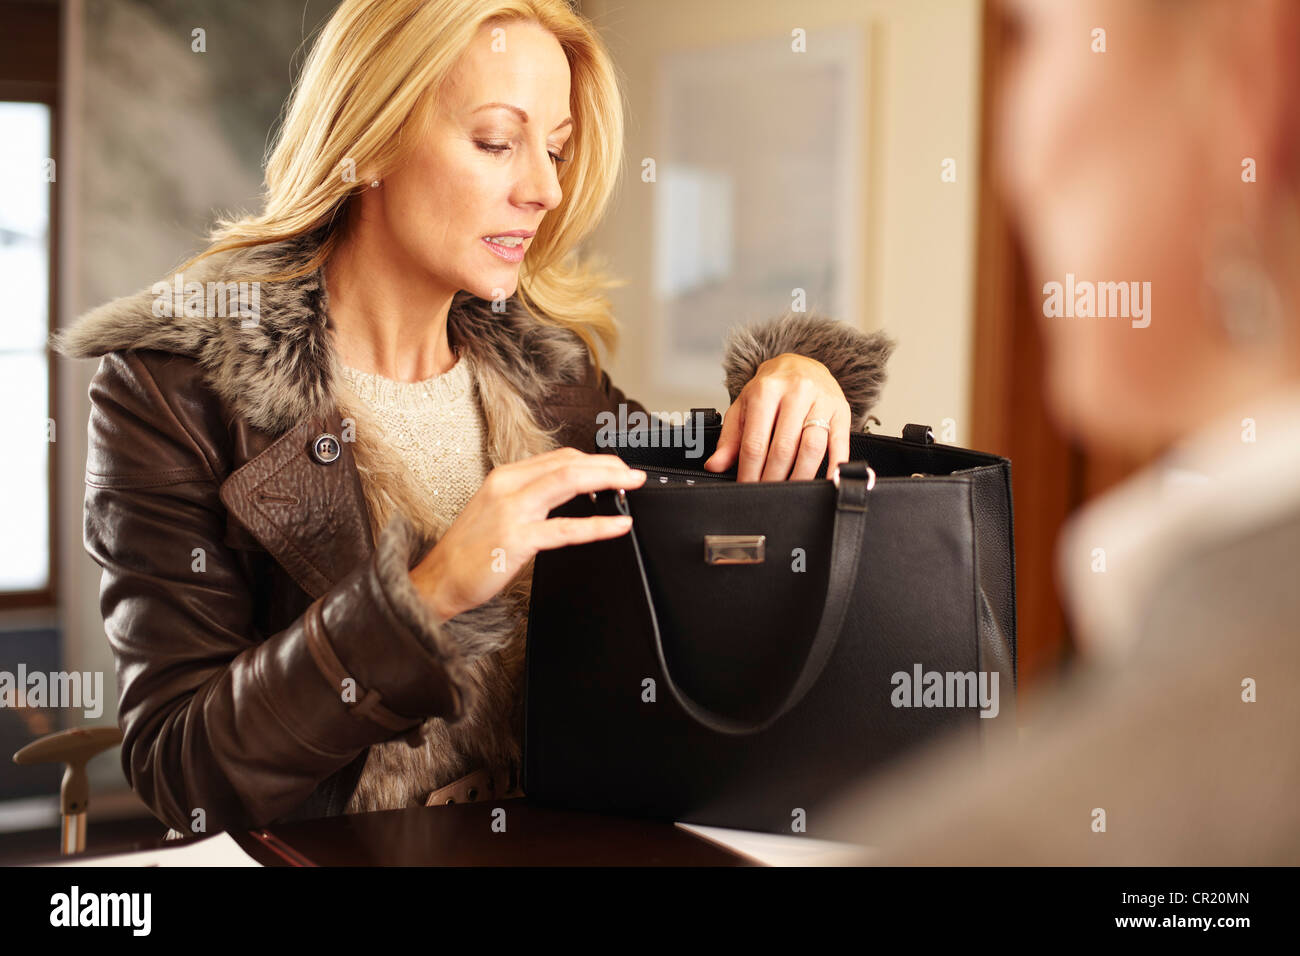 Woman rummaging through purse - Stock Image